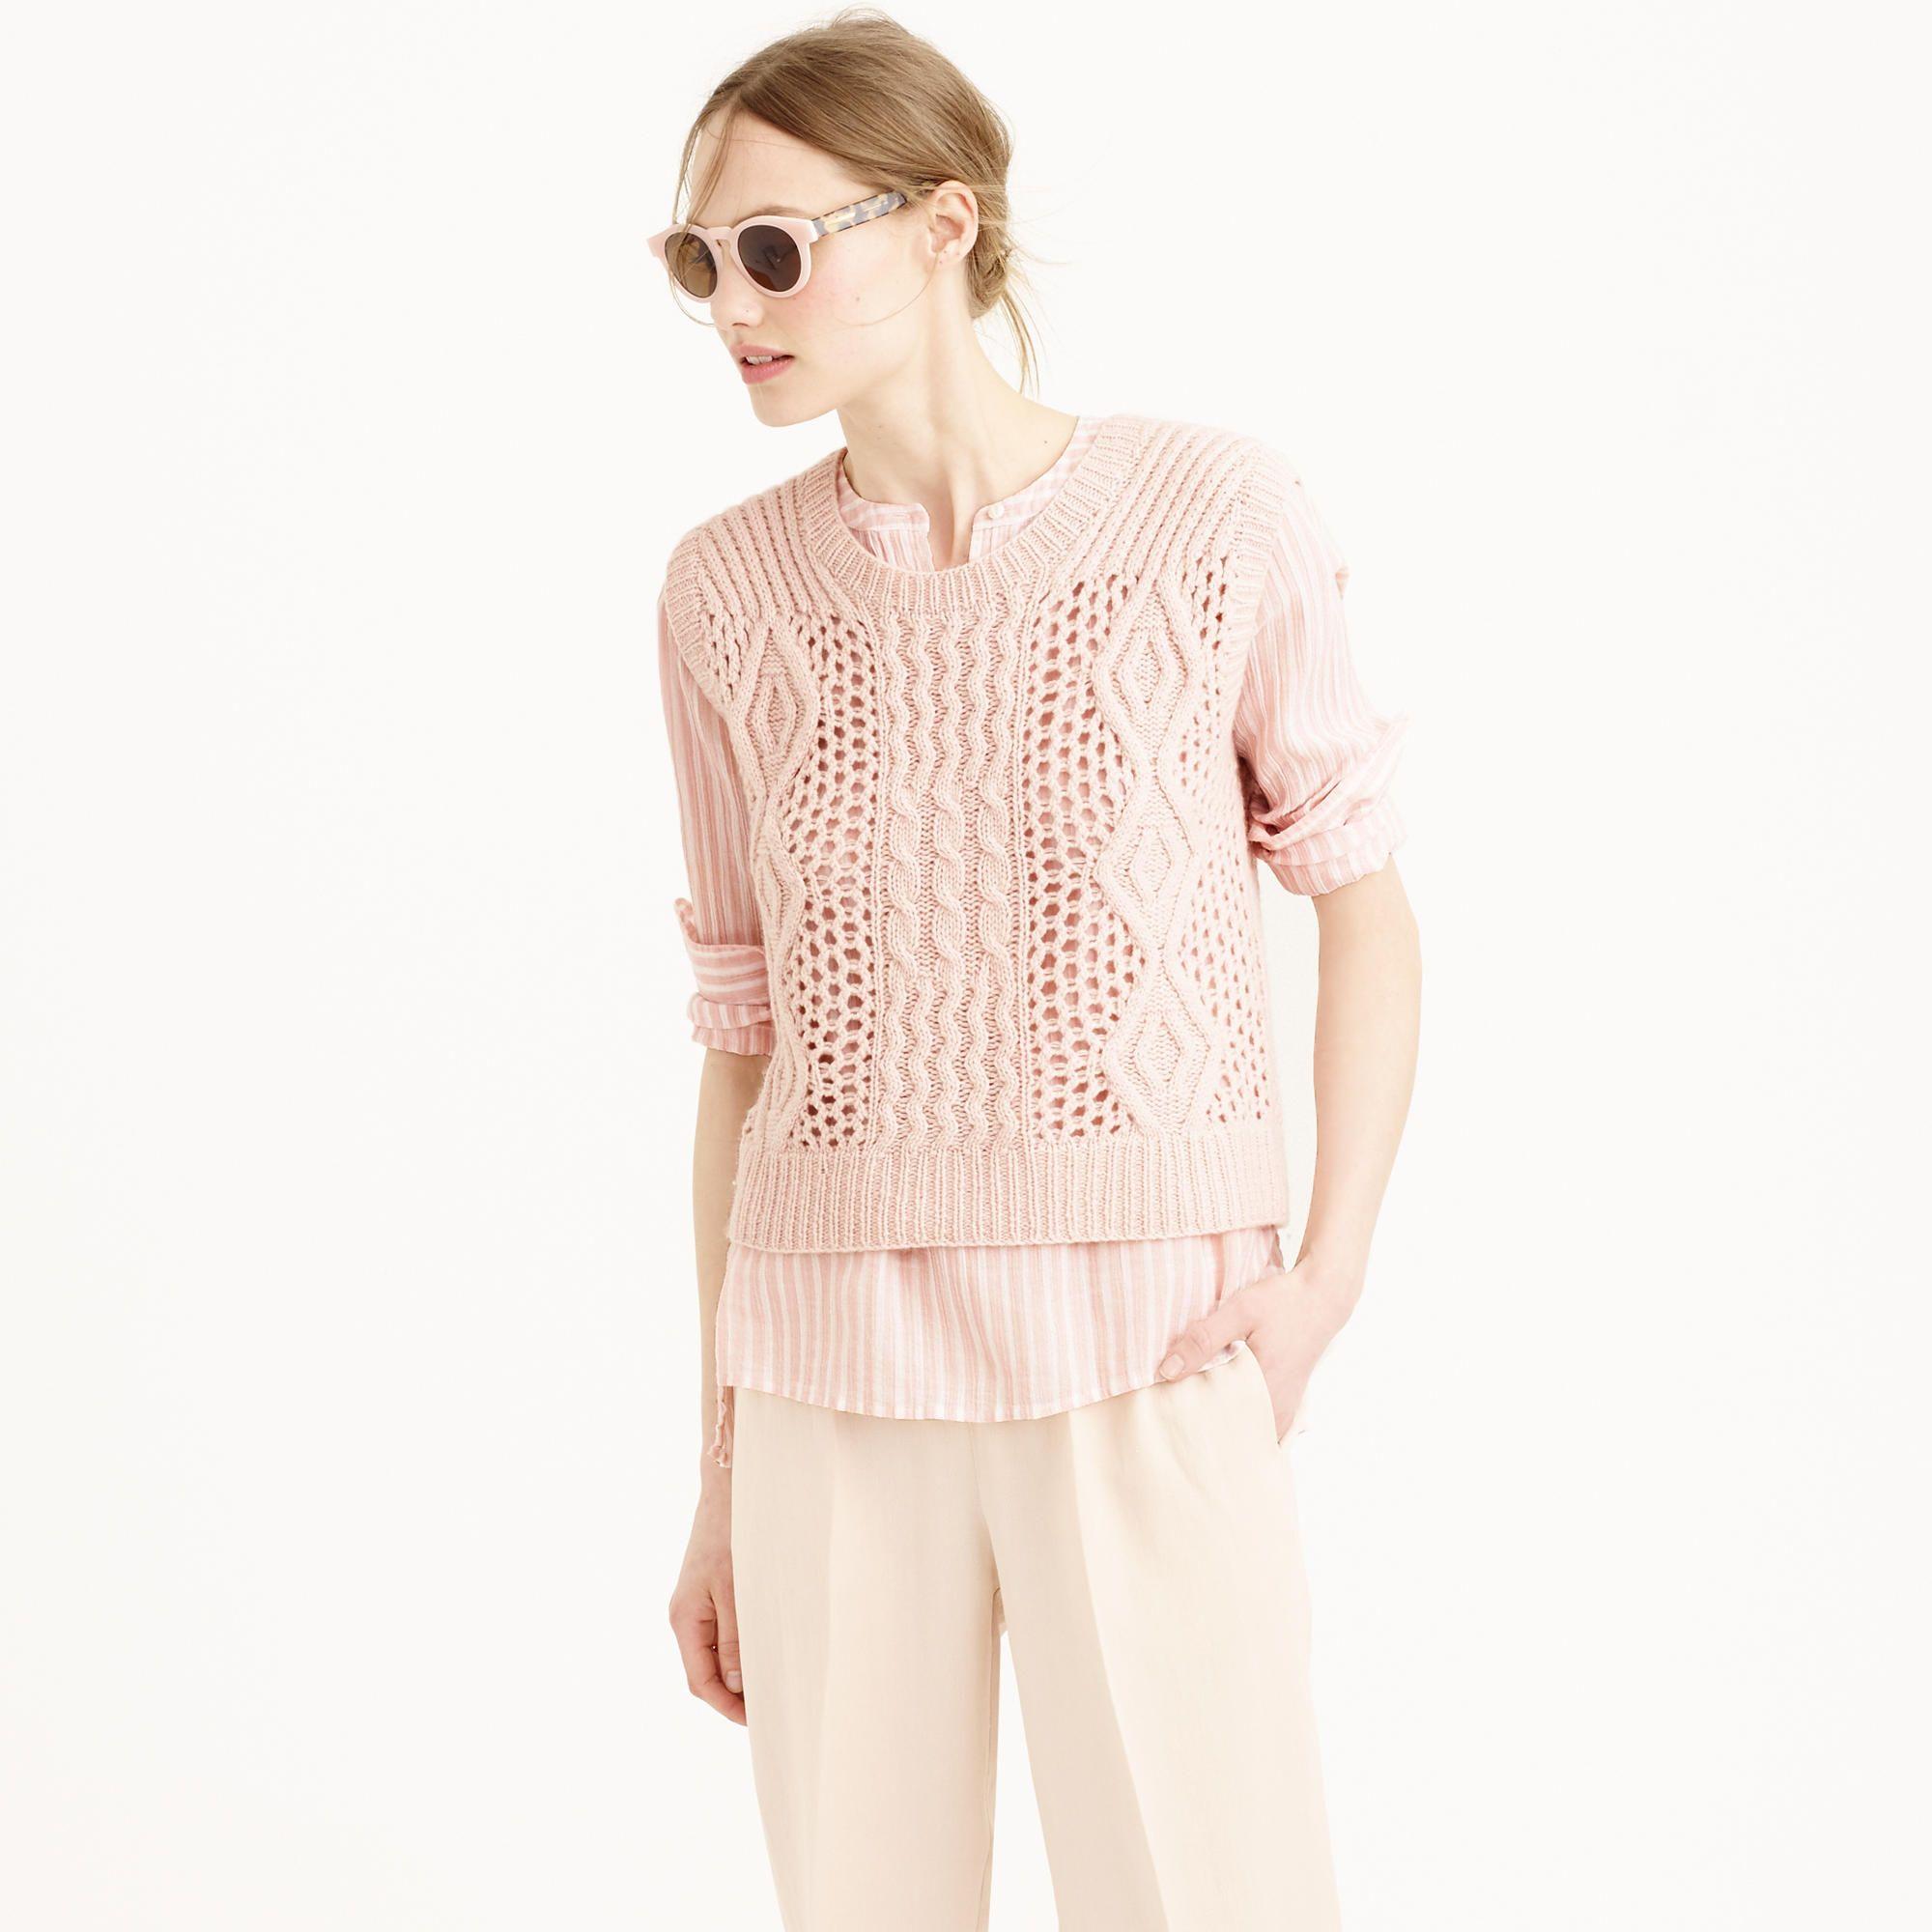 Ryan Roche™ for J.Crew handknit cashmere sweater-vest - Ryan Roche ...